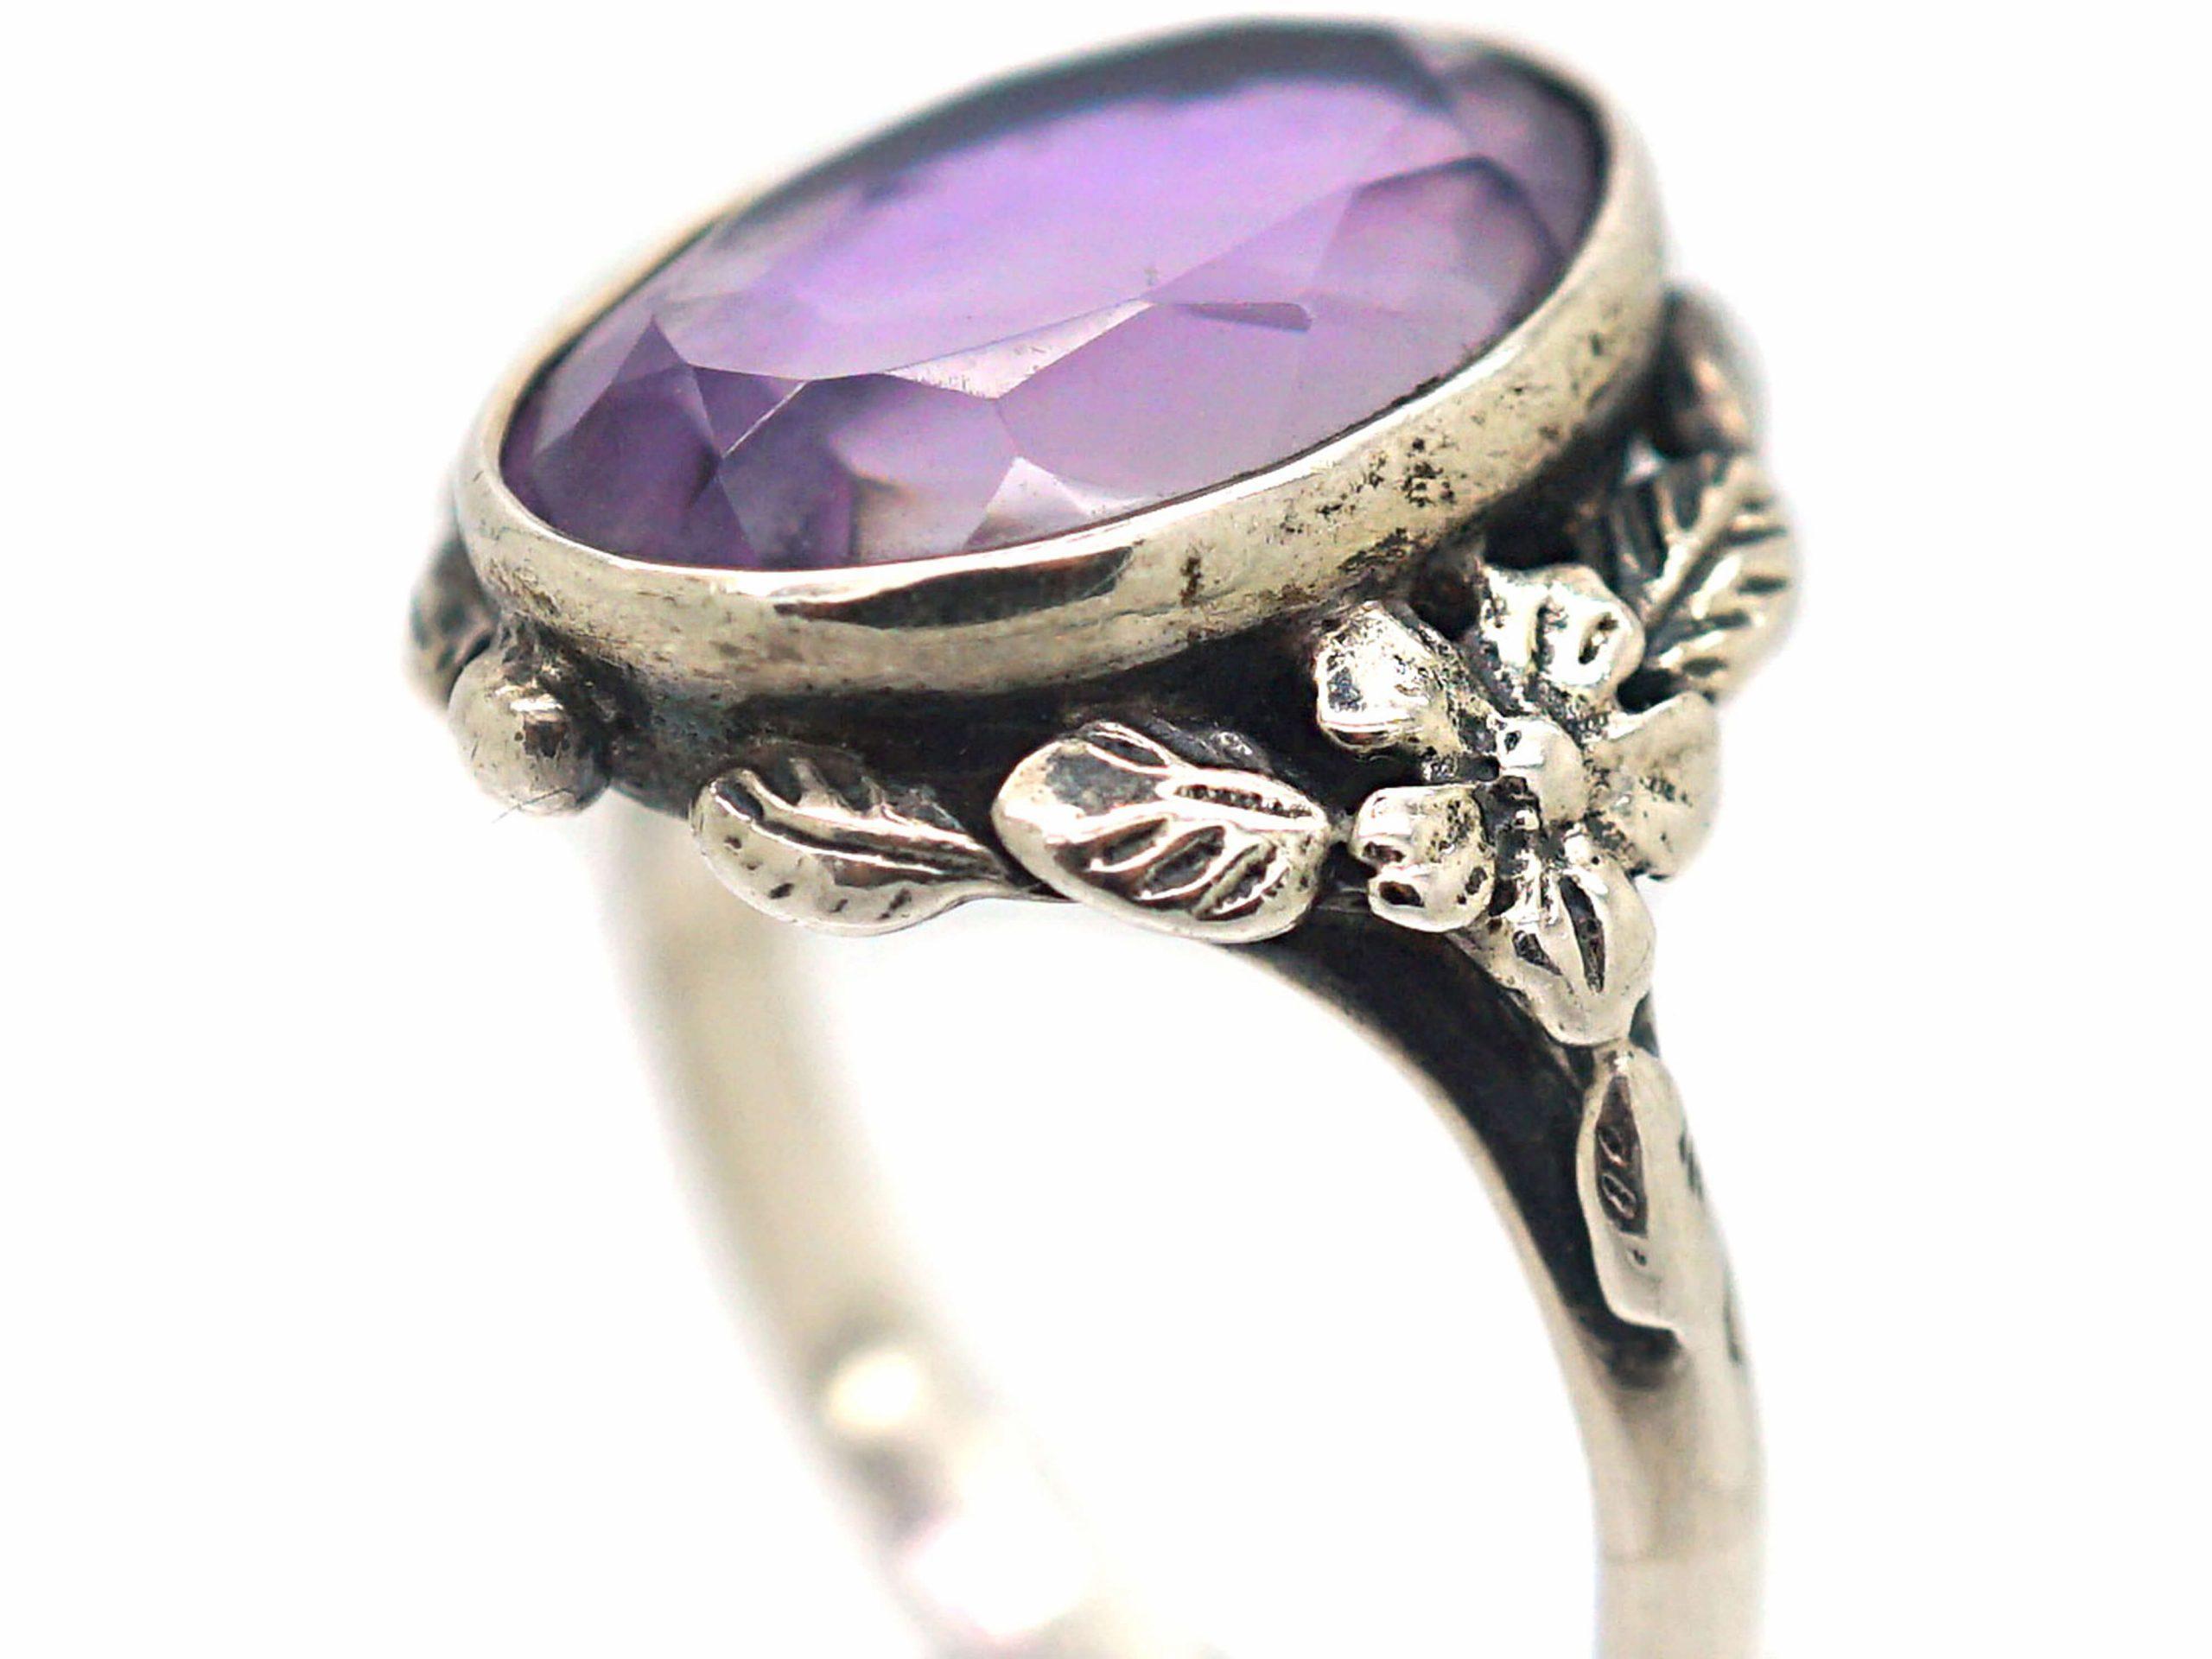 Silver & Amethyst Arts & Crafts Ring Attributed to Bernard Instone